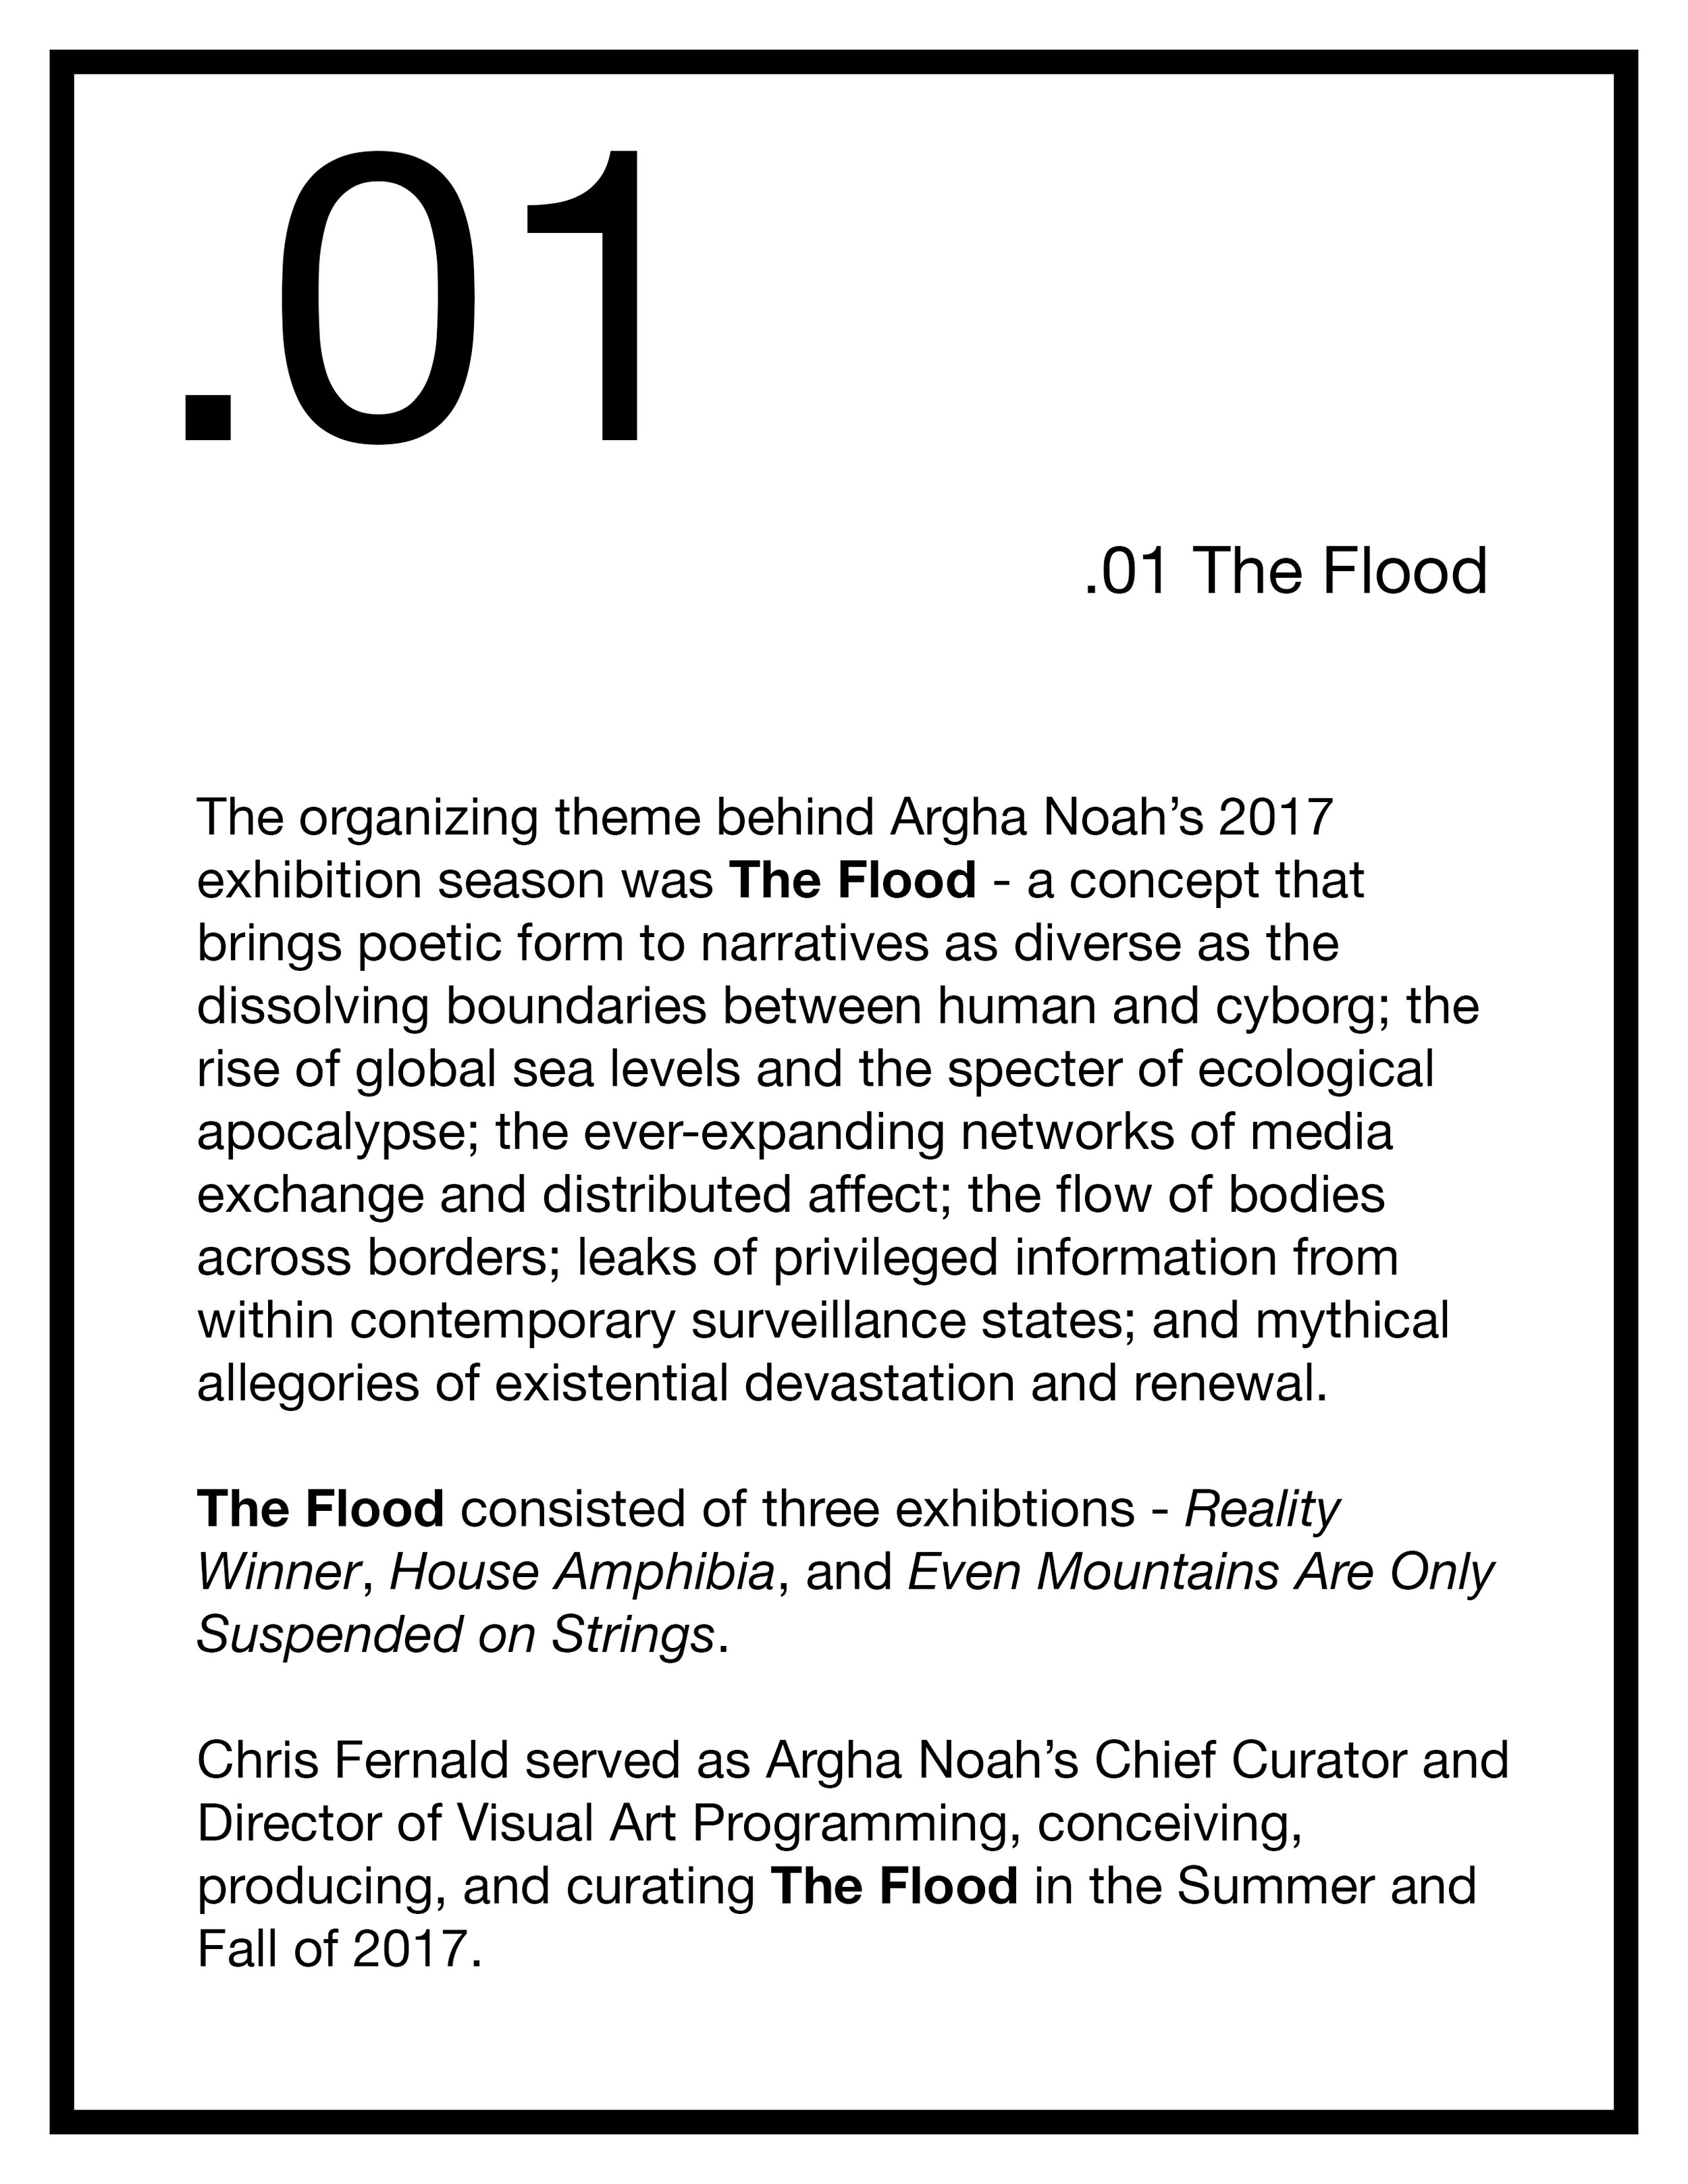 01 the floodessay.jpg